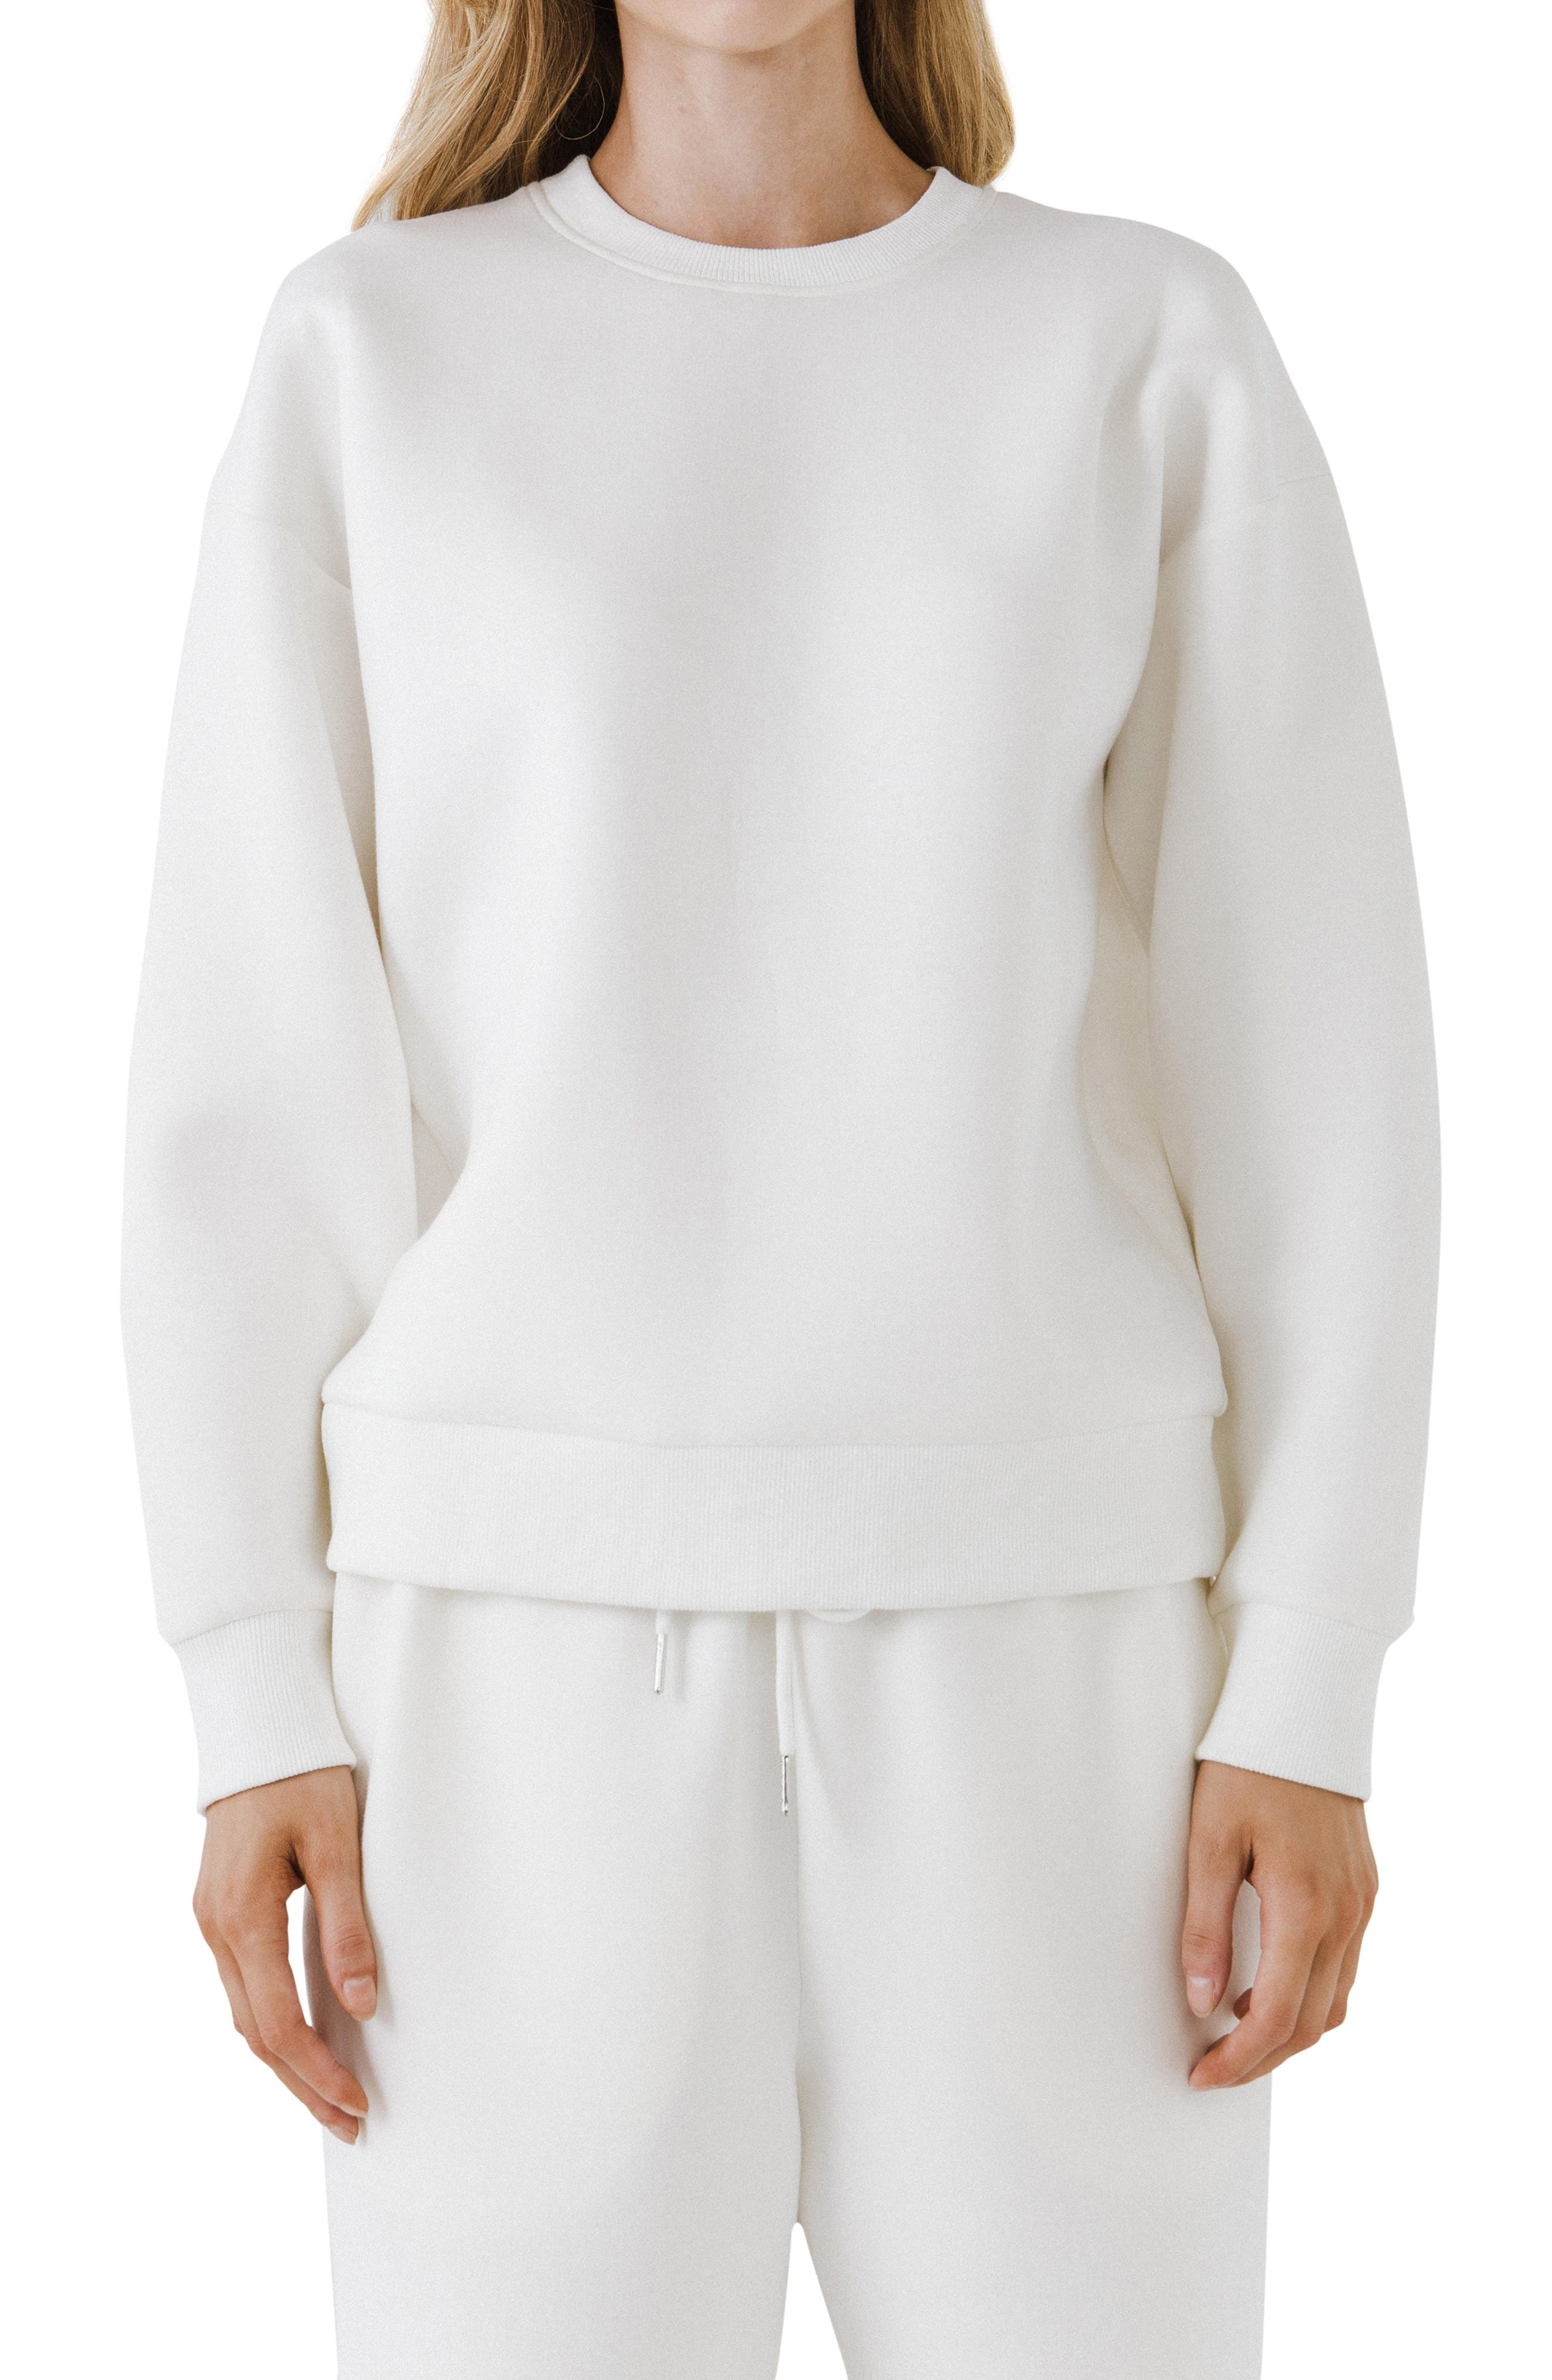 Lounge Wear Crewneck Sweatshirt